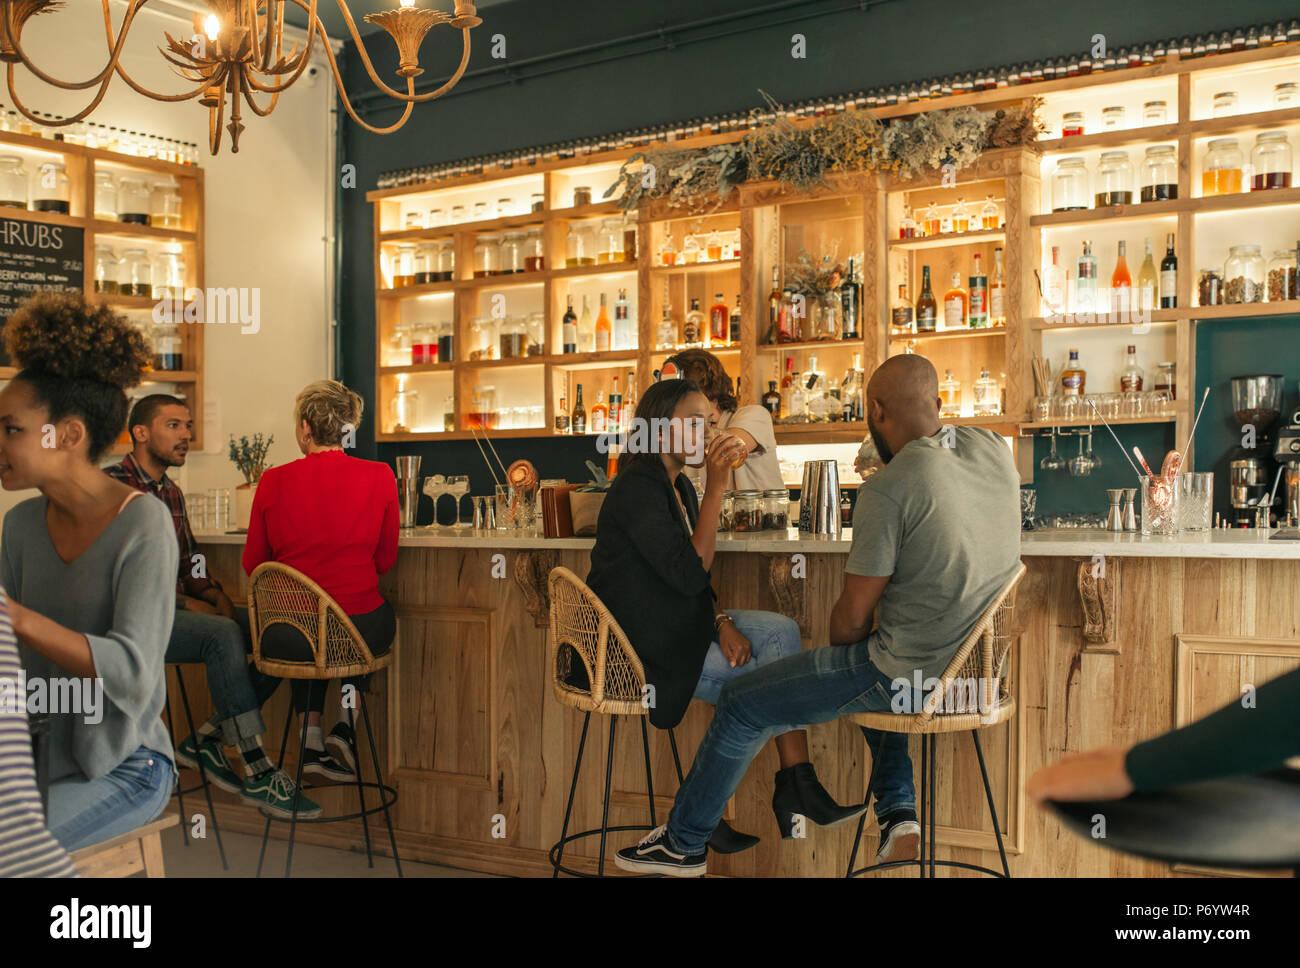 Pareja joven afroamericano bebiendo juntos en un bar. Imagen De Stock